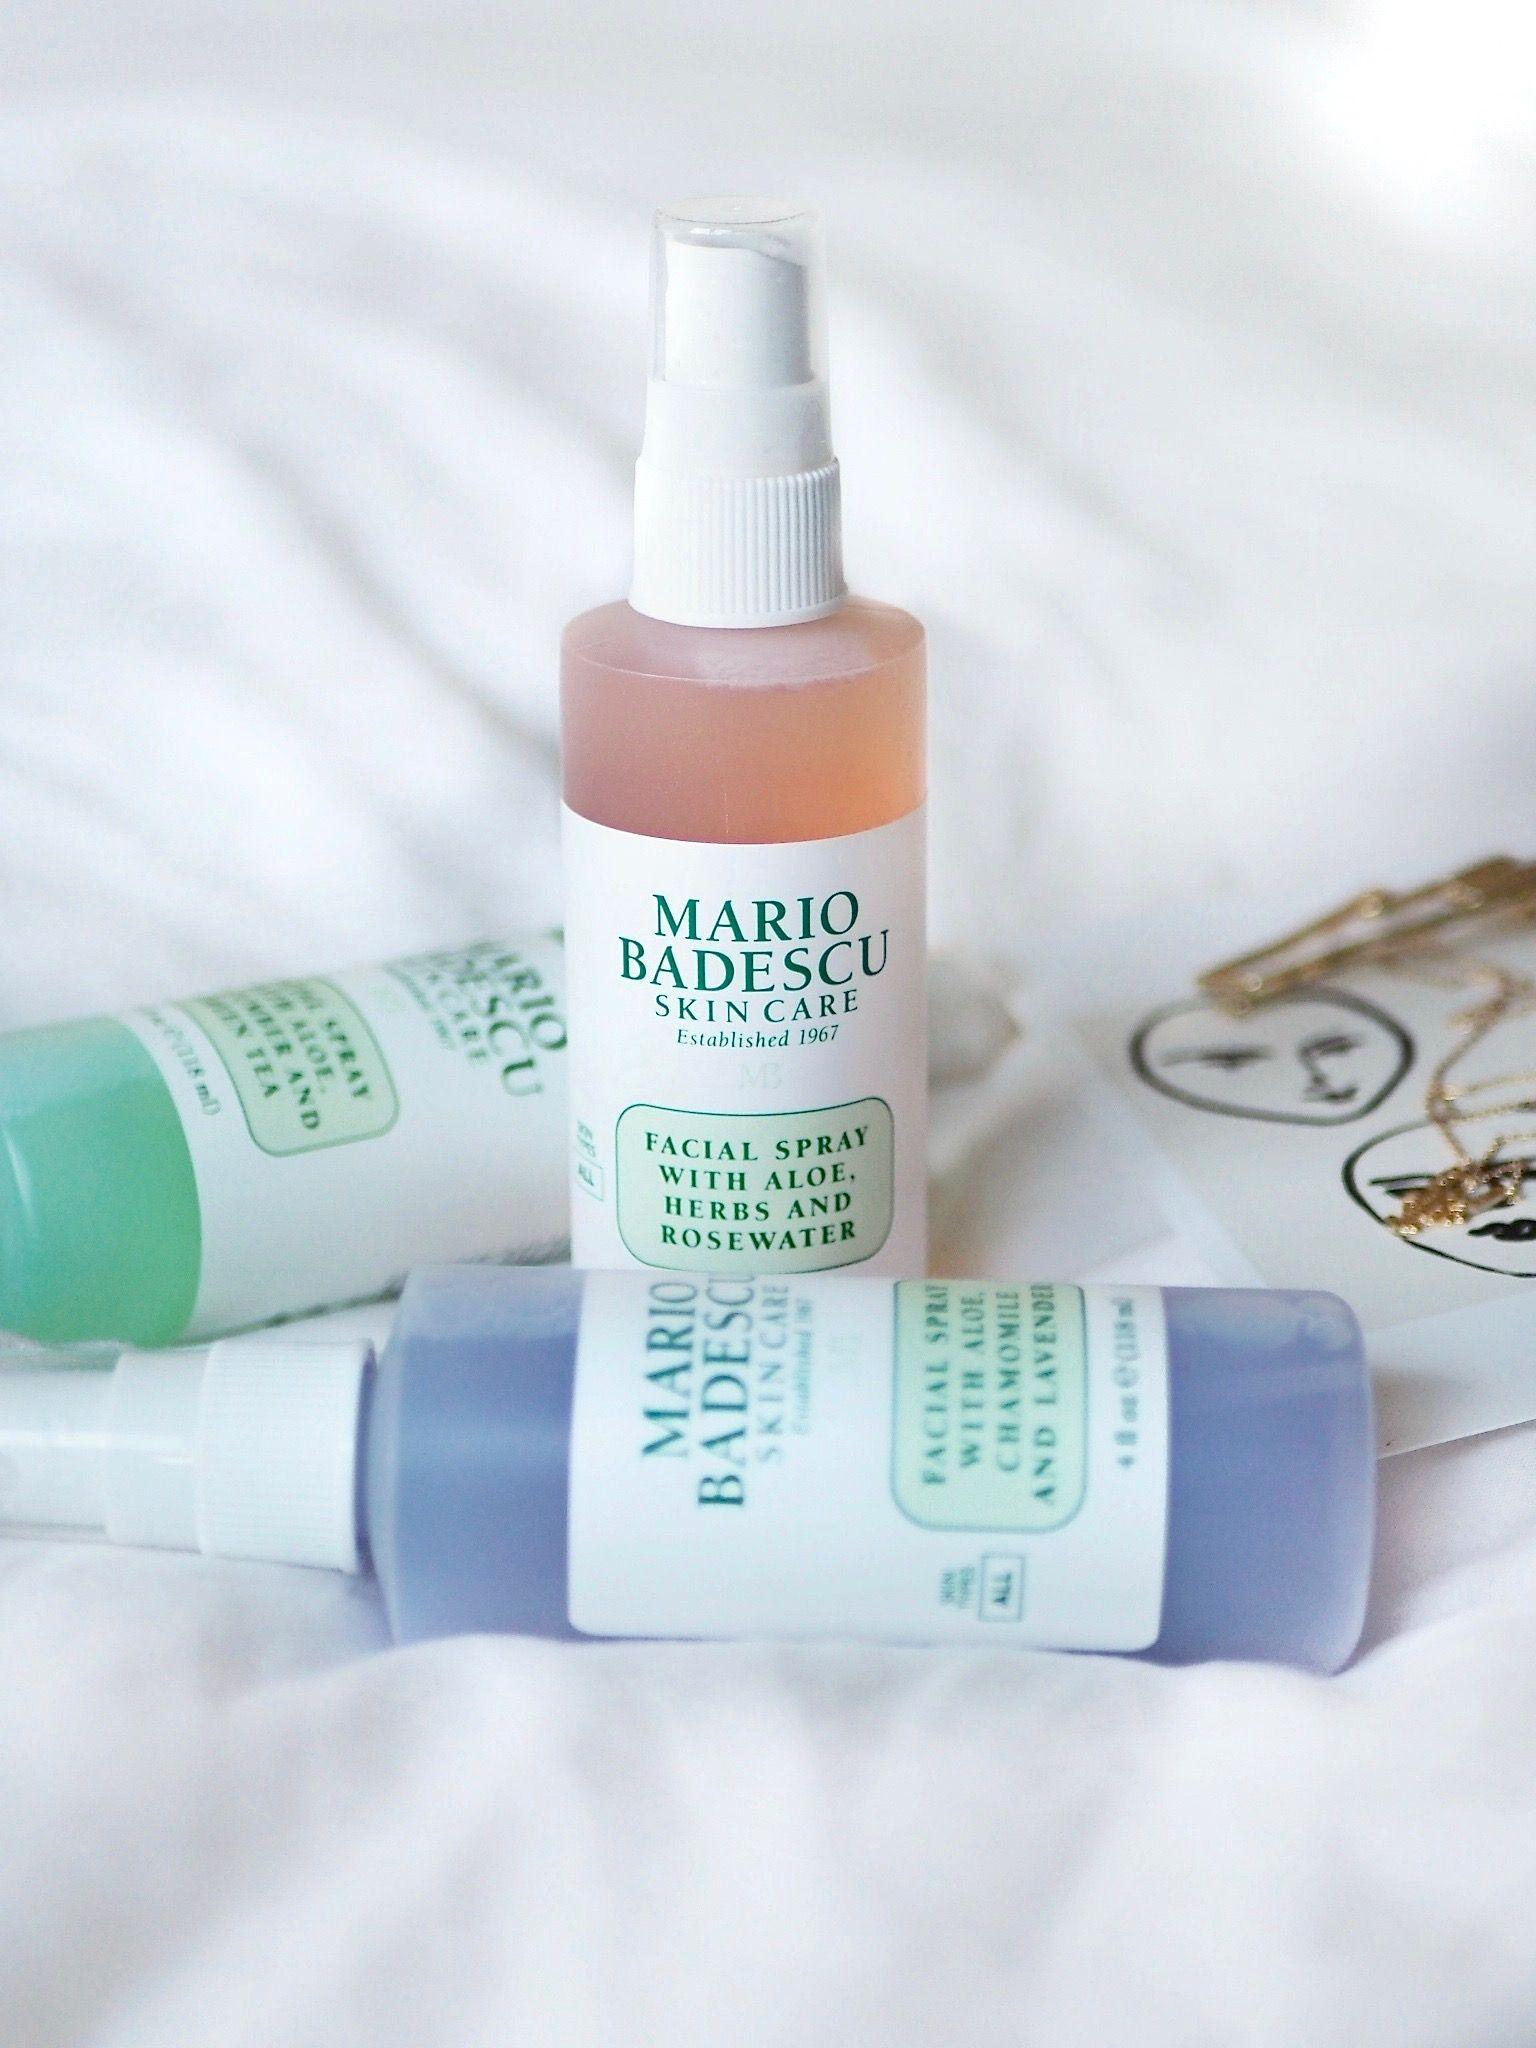 Mario Badescu Facial Spray Lotion for dry skin, Skin